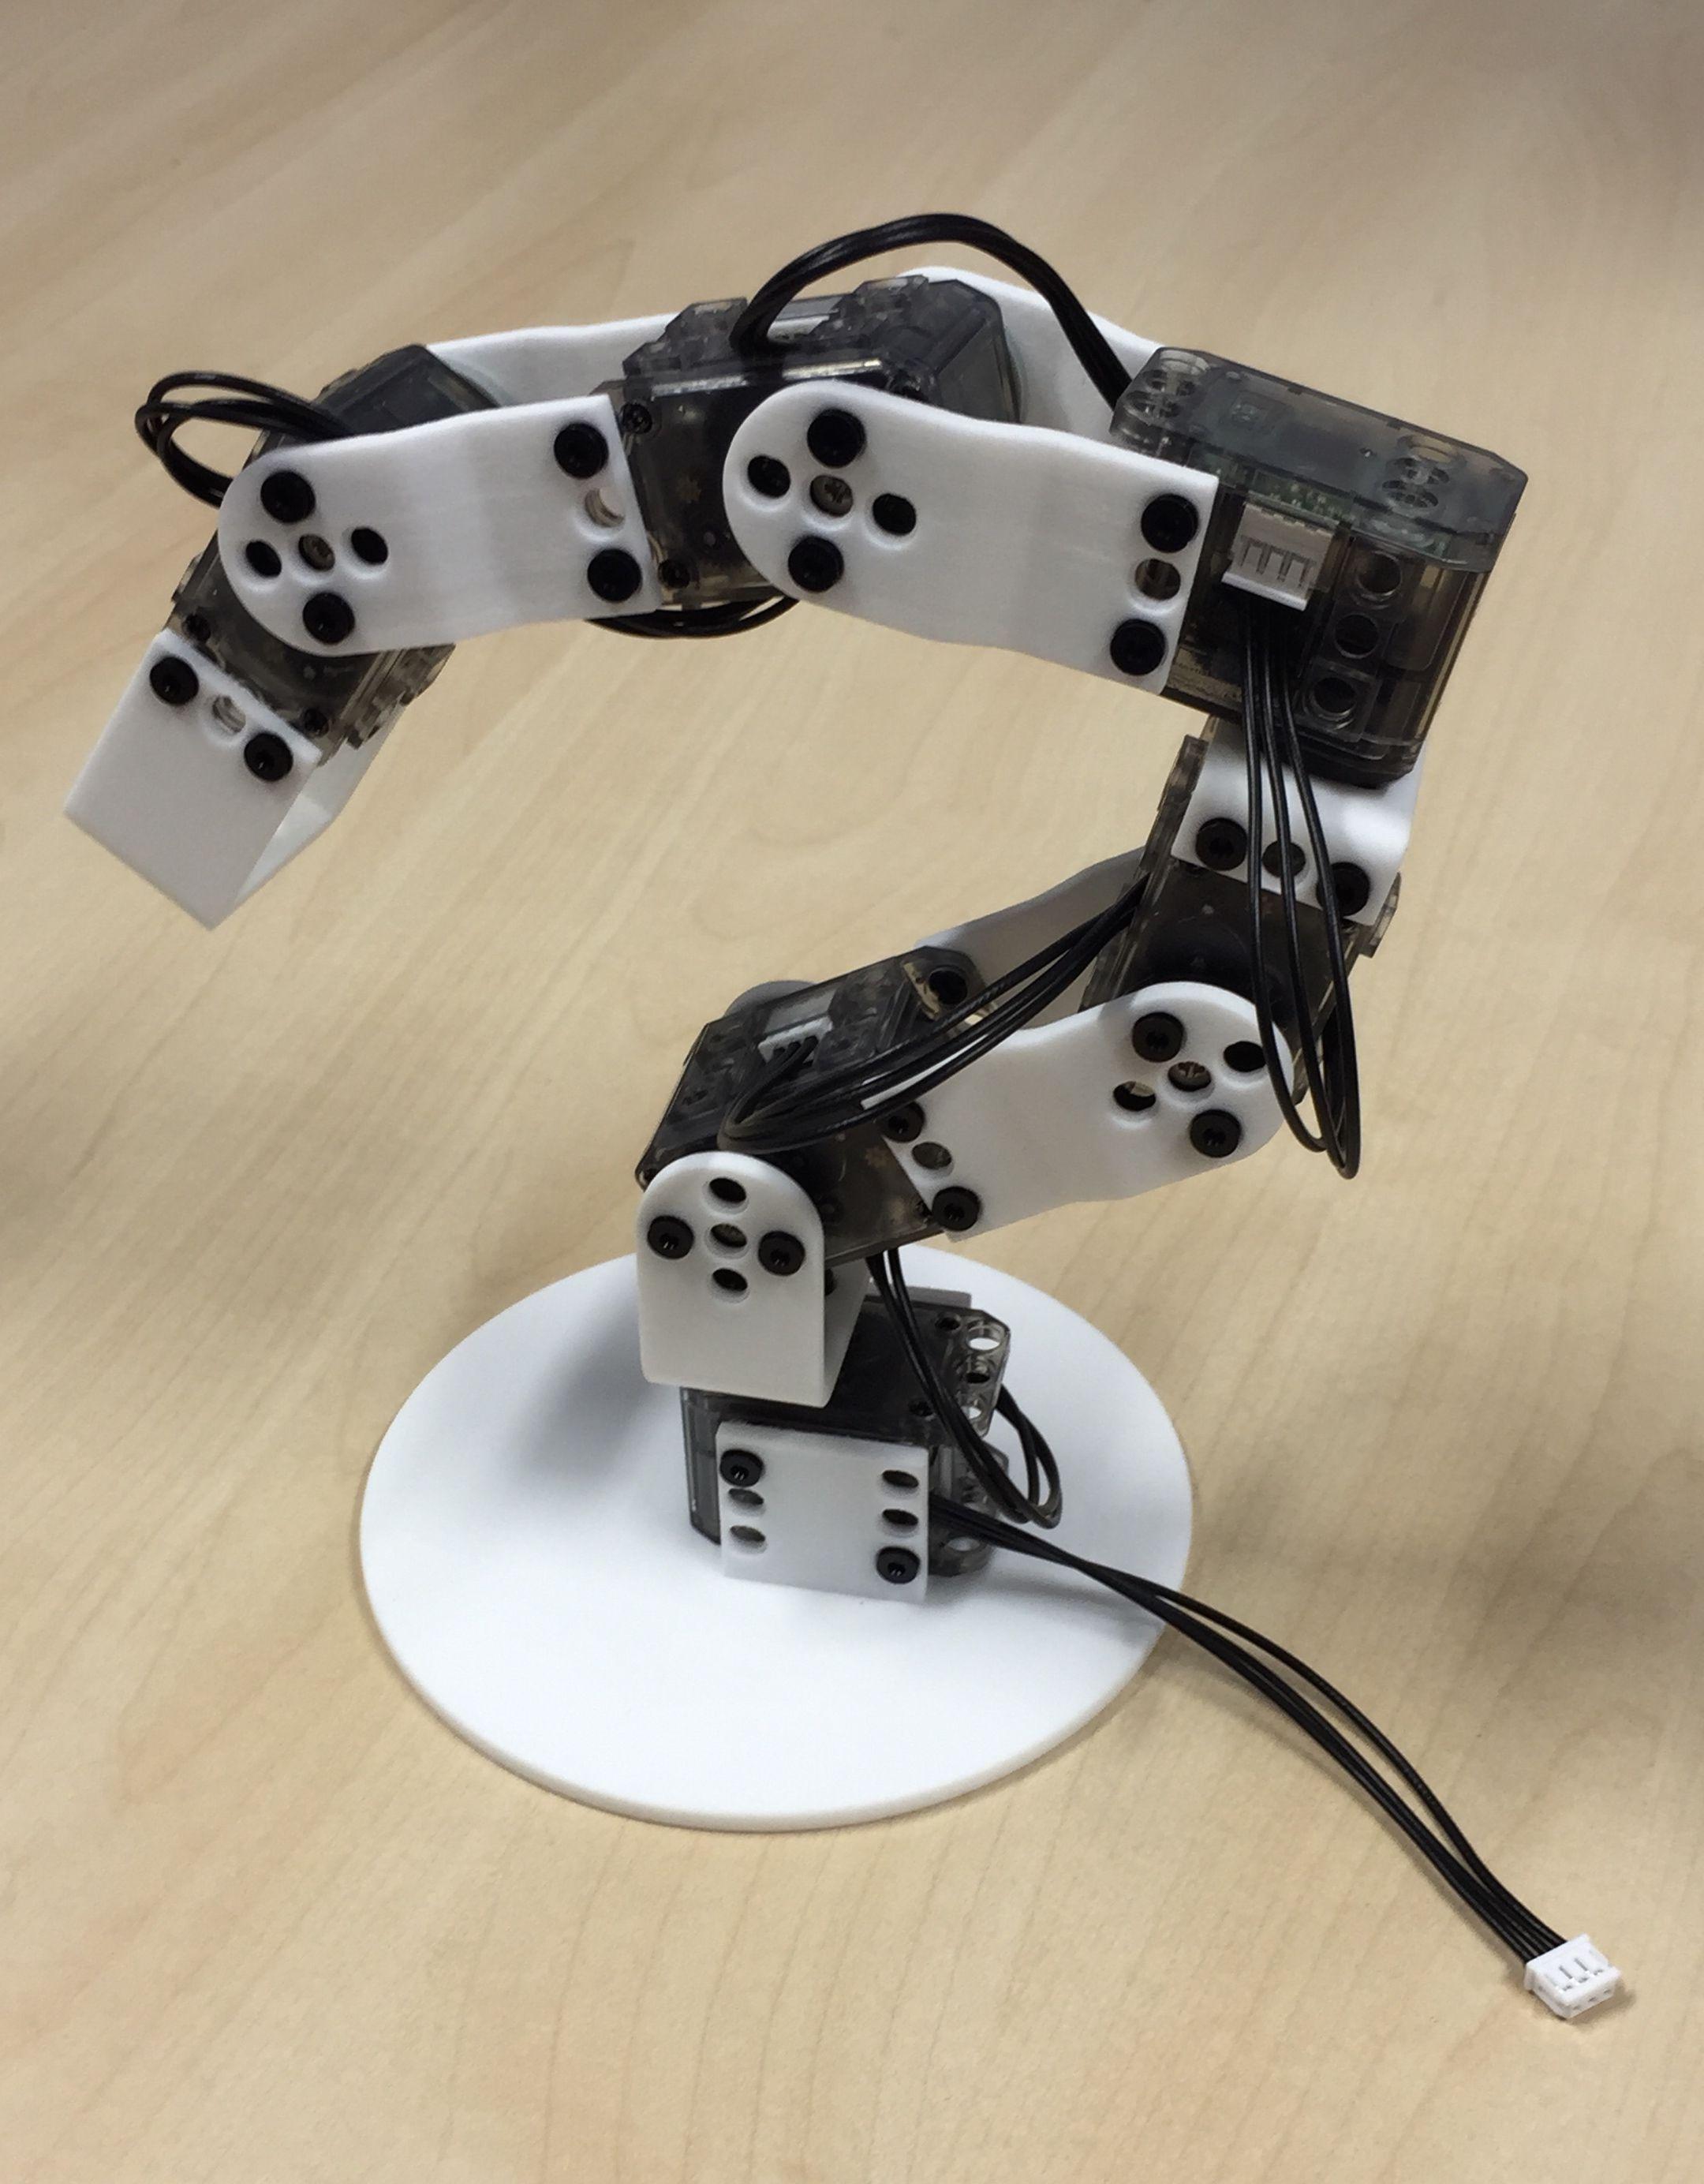 PoppyErgoJr | Robot | Robot, Robot arm, Projects